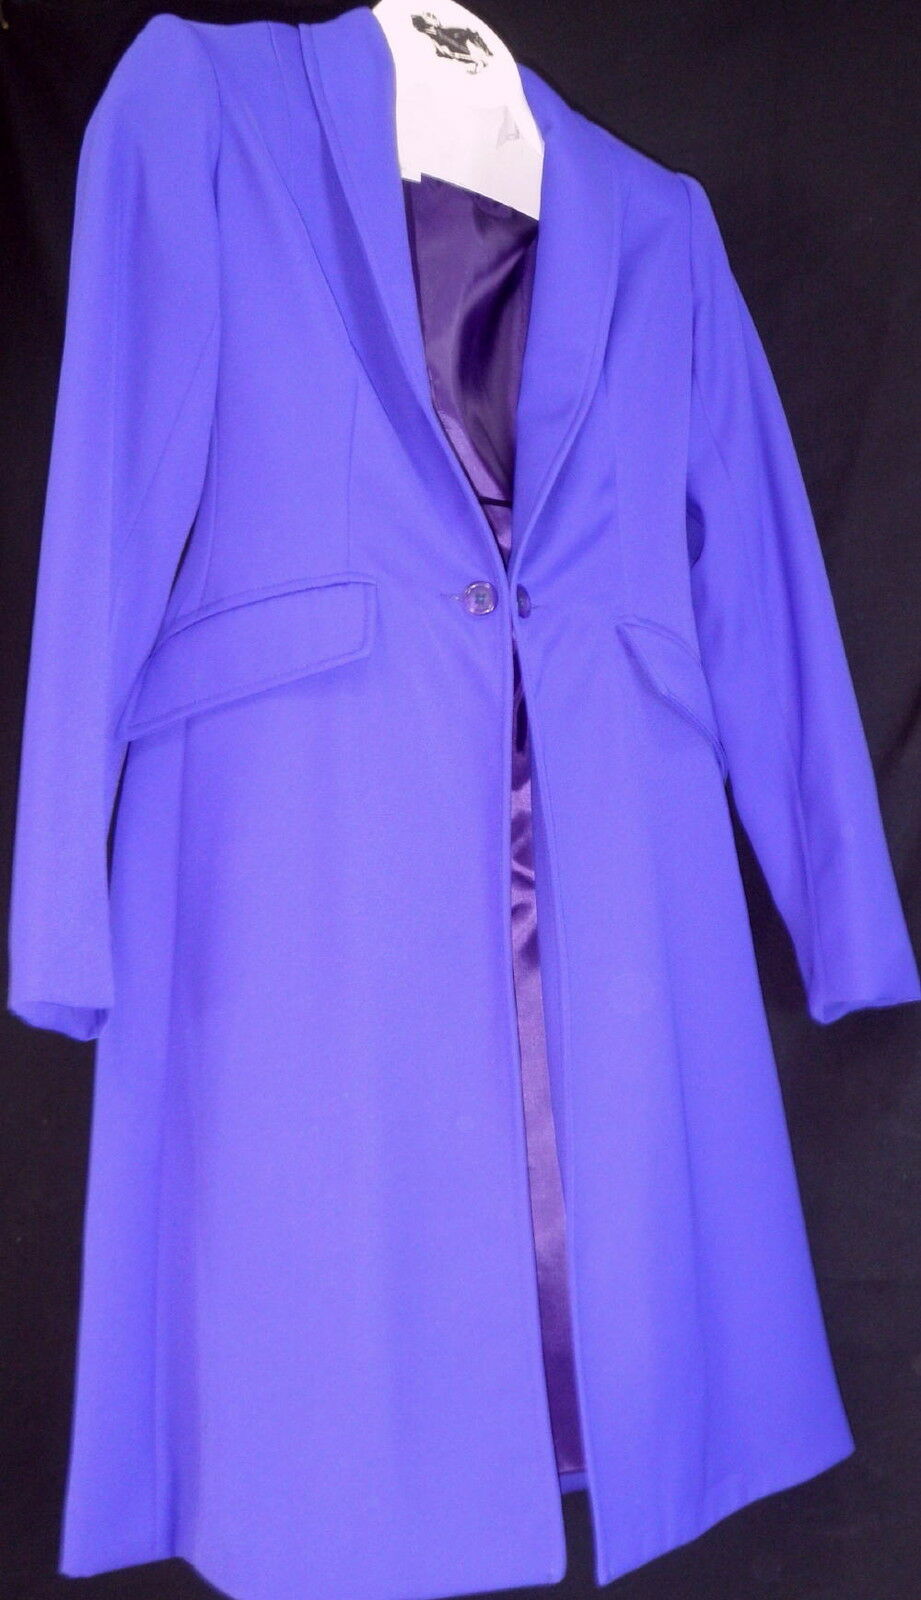 Reed Hill Ladies  Saddleseat Day Coat Purple Polyester size 10 - USA  amazing colorways